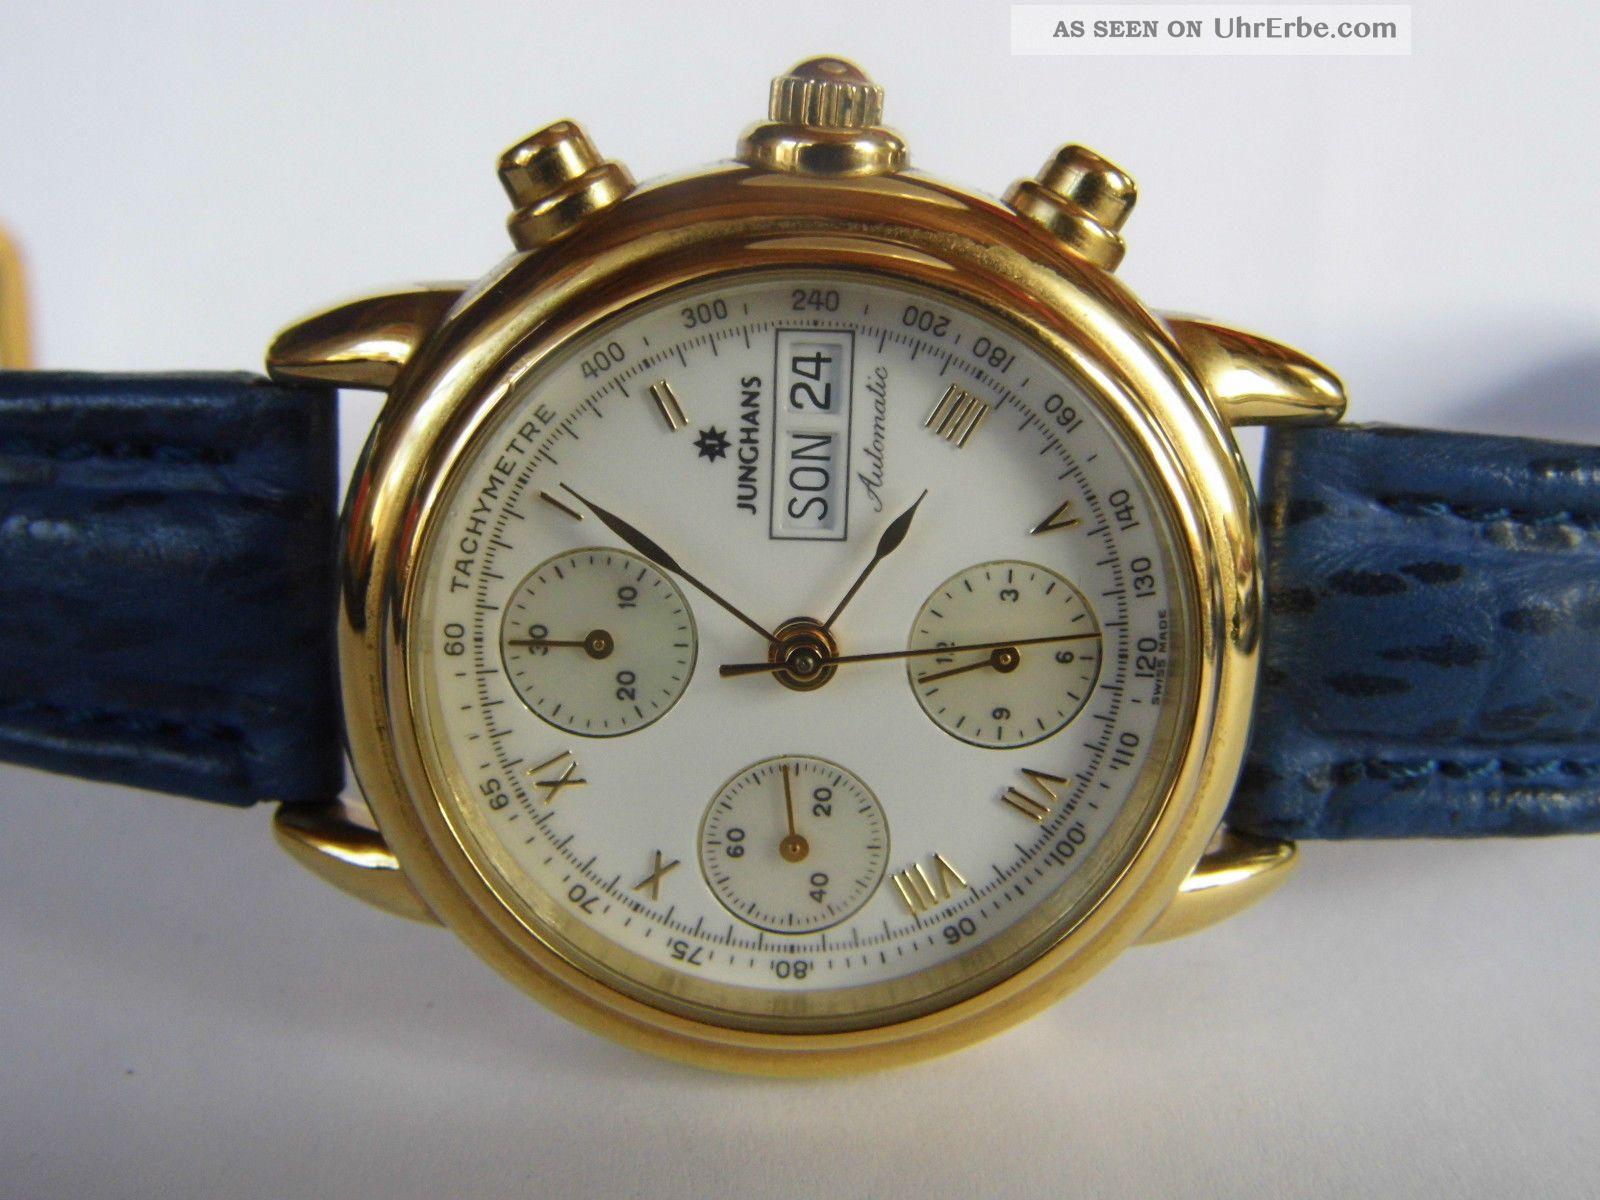 Herrenuhr,  Automatic - Chronograph Junghans Vergoldet Eta 7750 - Werk Läuft Armbanduhren Bild